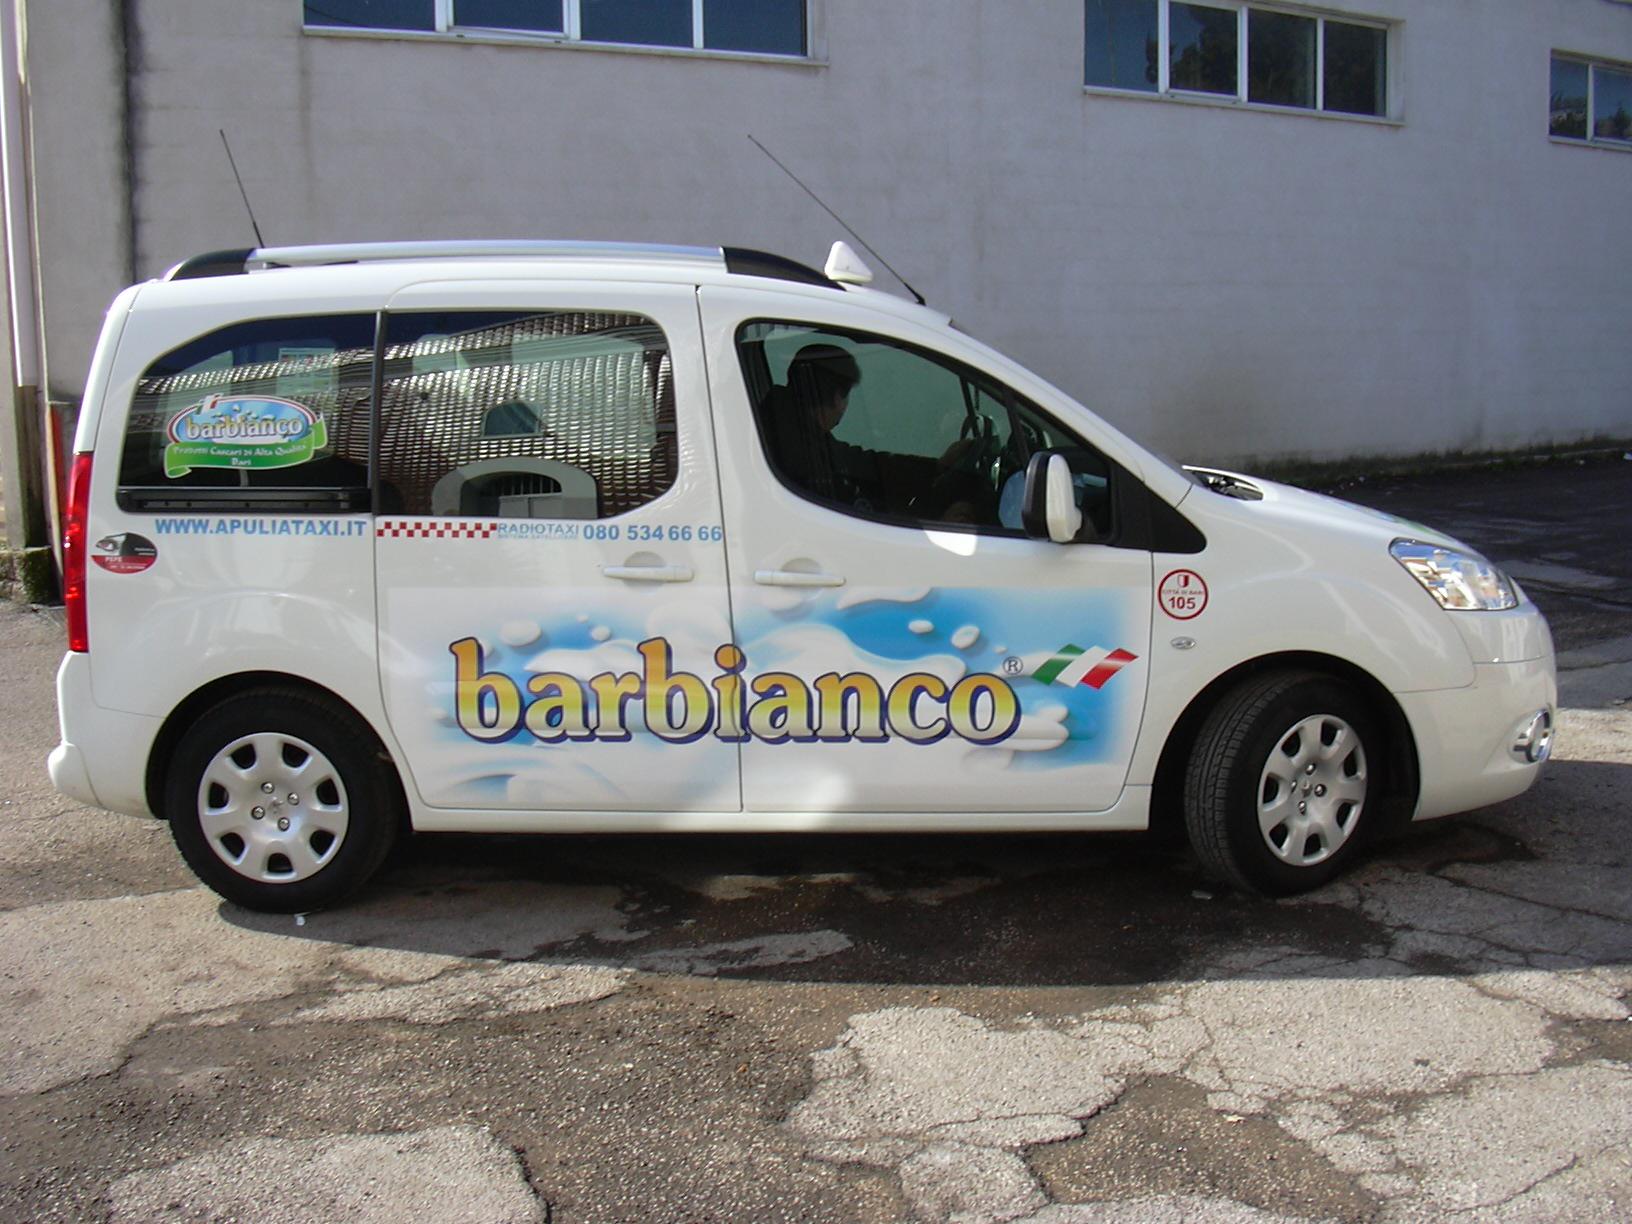 Barbianco